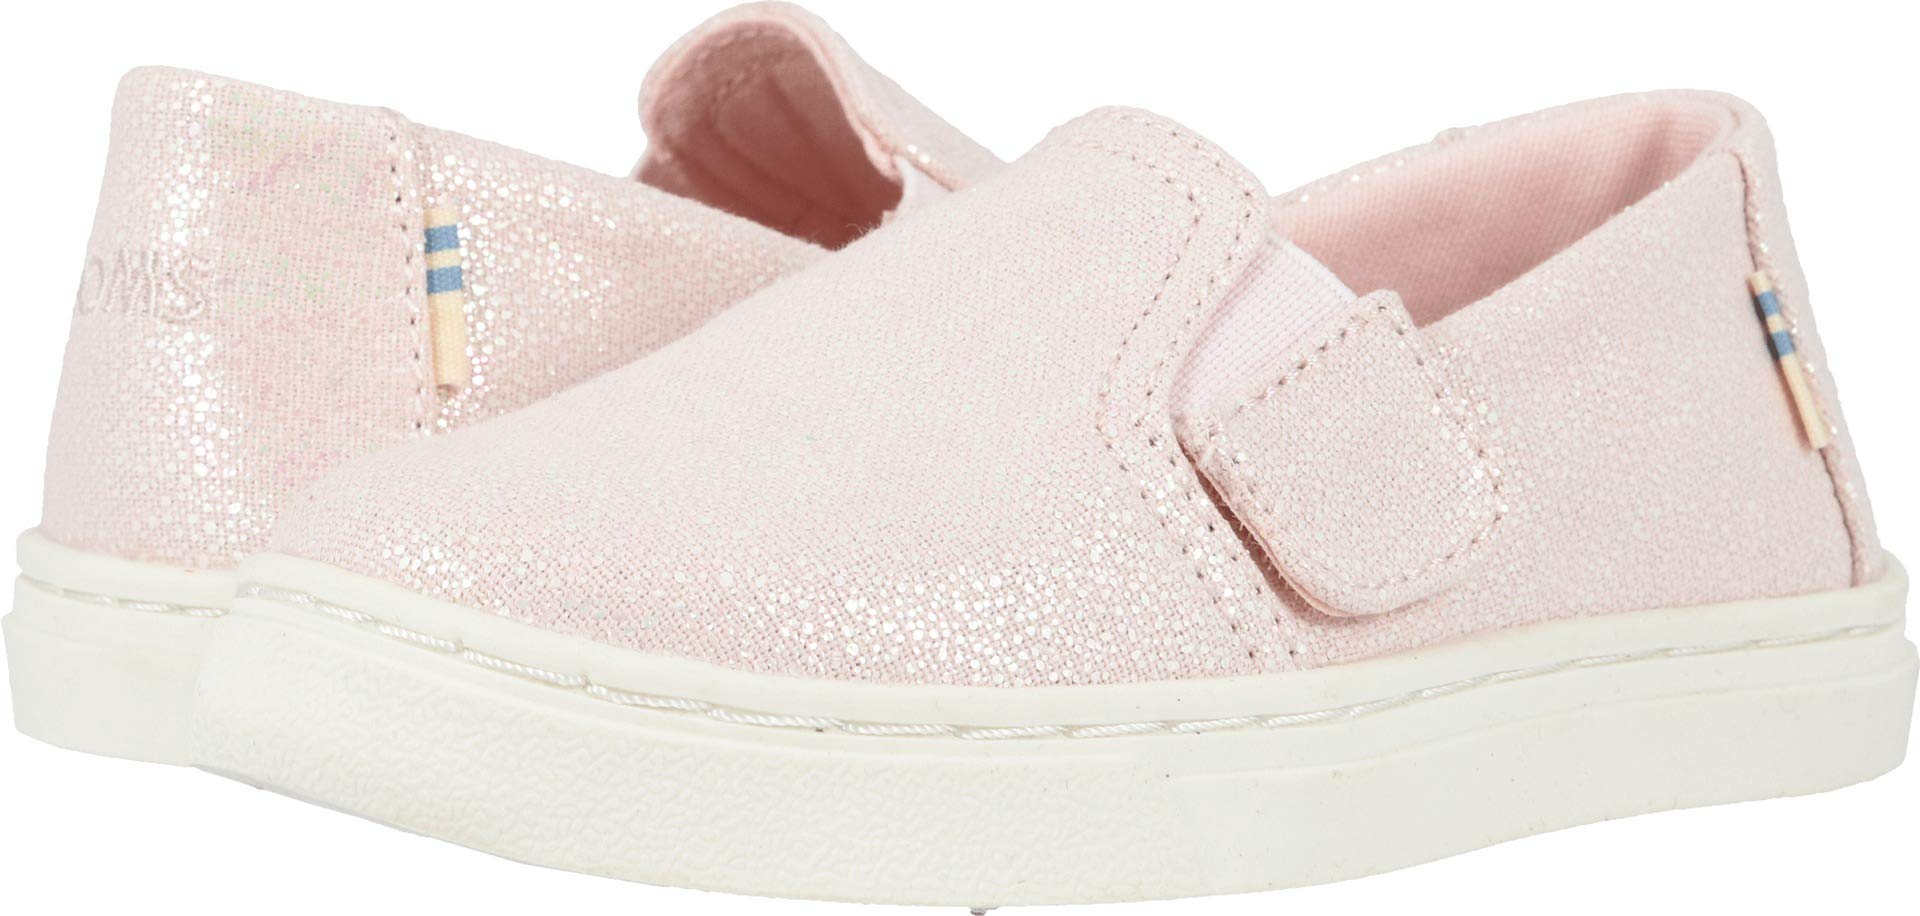 TOMS Luca Tiny Girls' Infant-Toddler Slip On 6 M US Toddler Pink-Iridescent